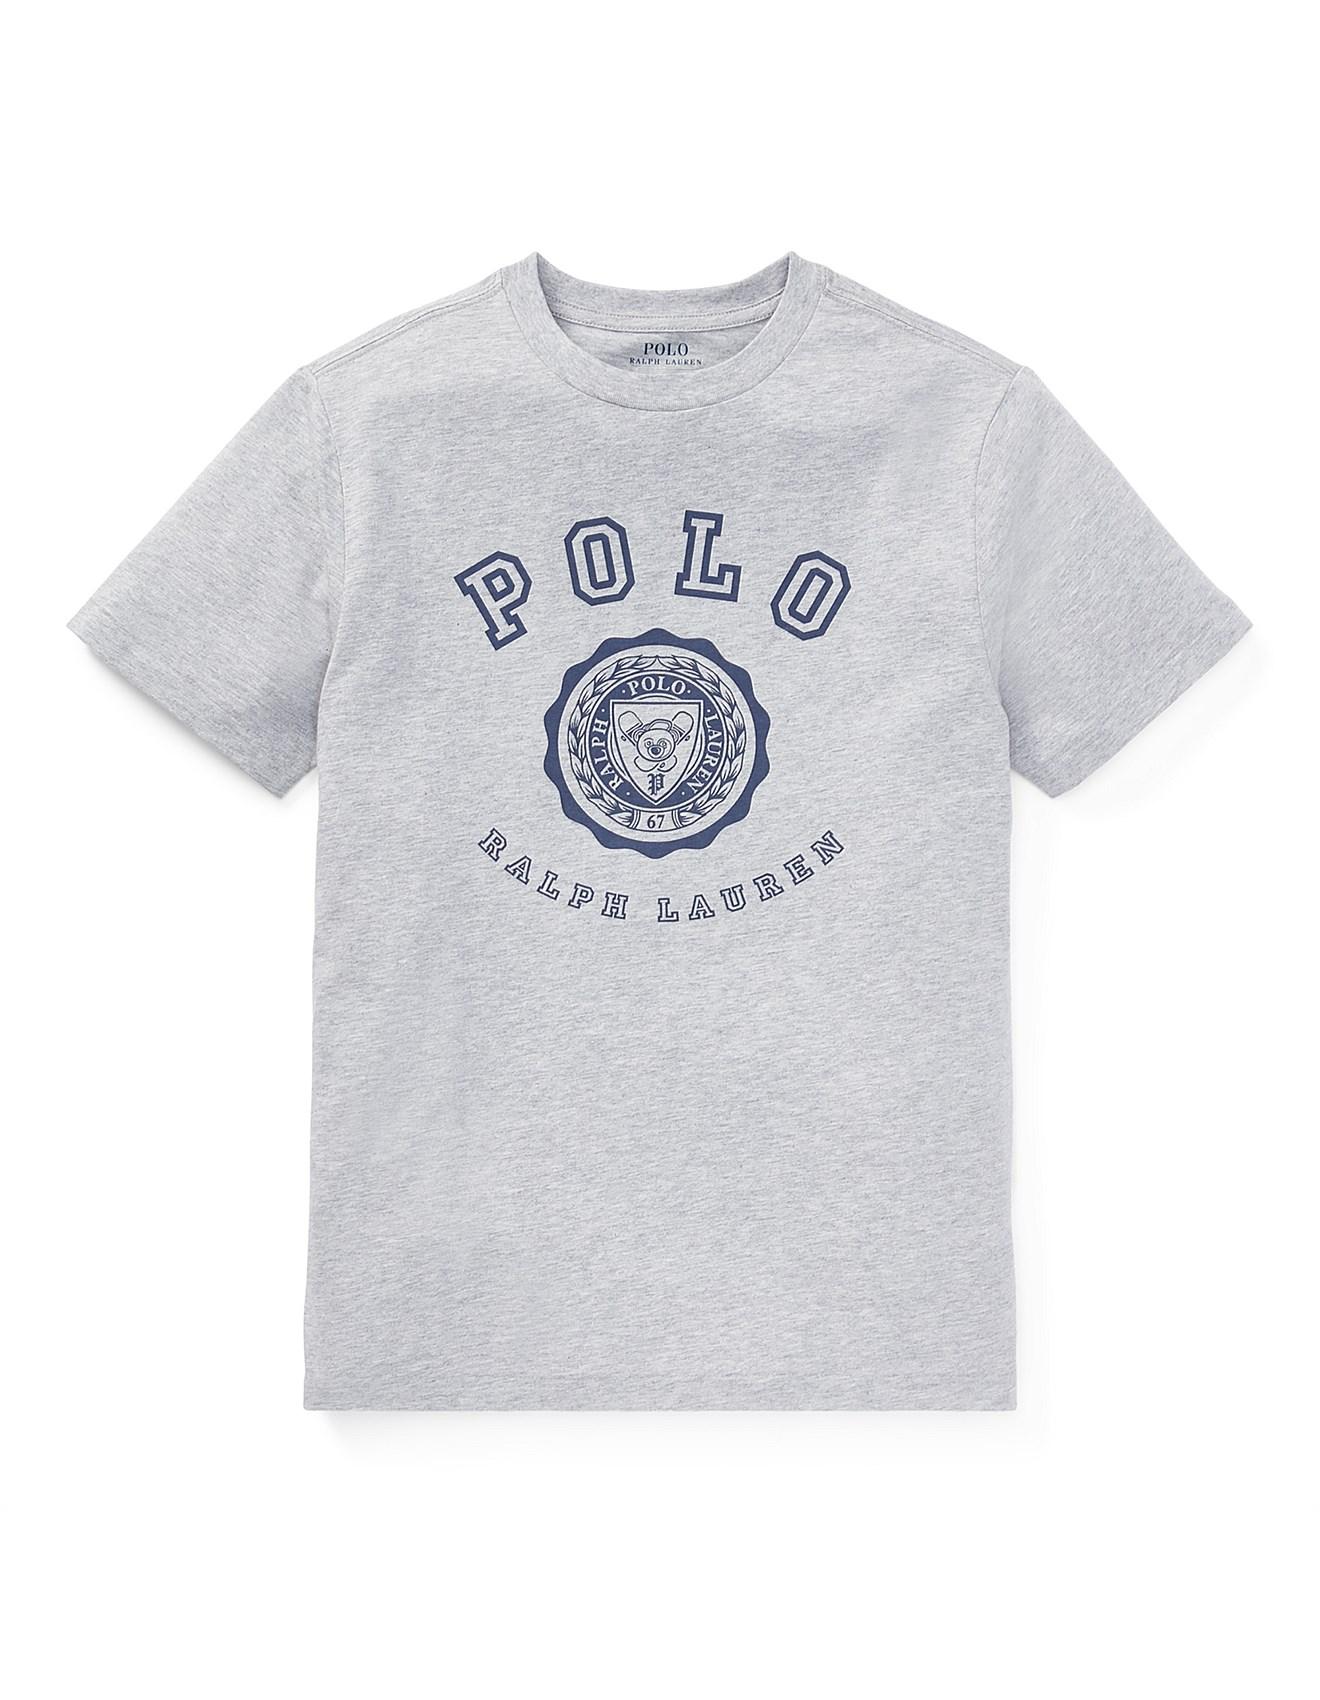 Kids - Cotton Jersey Graphic T-Shirt (4-7 Years) c649fd857